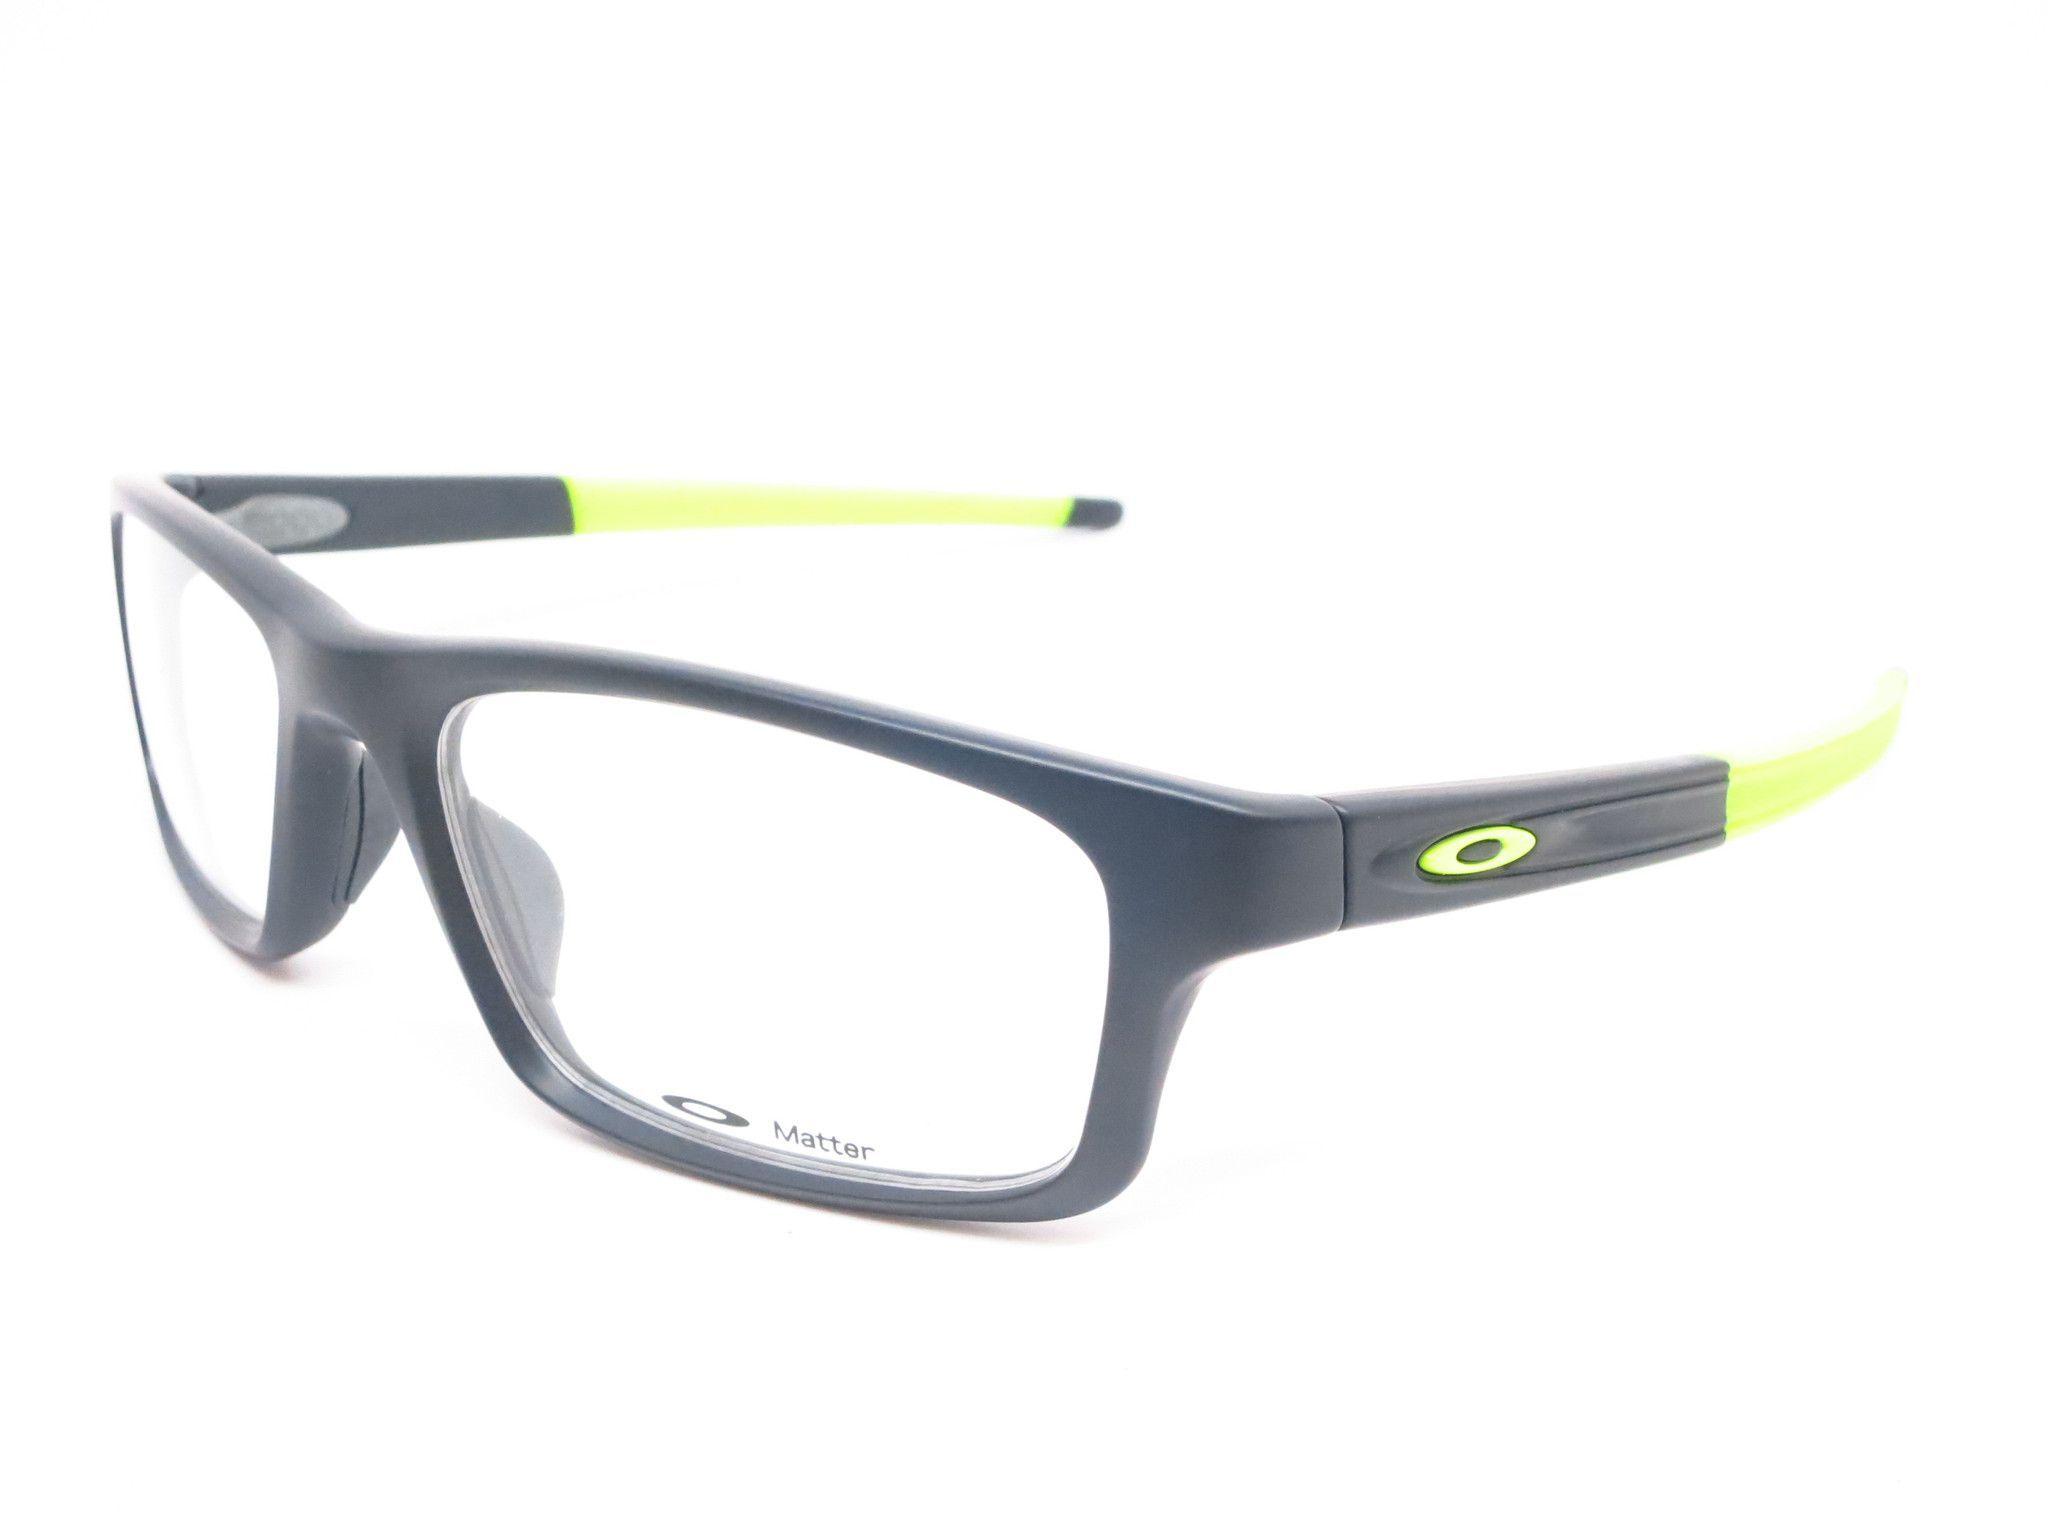 6dfd23b2dc Oakley Crosslink Pitch OX8037-0954 Satin Black Eyeglasses